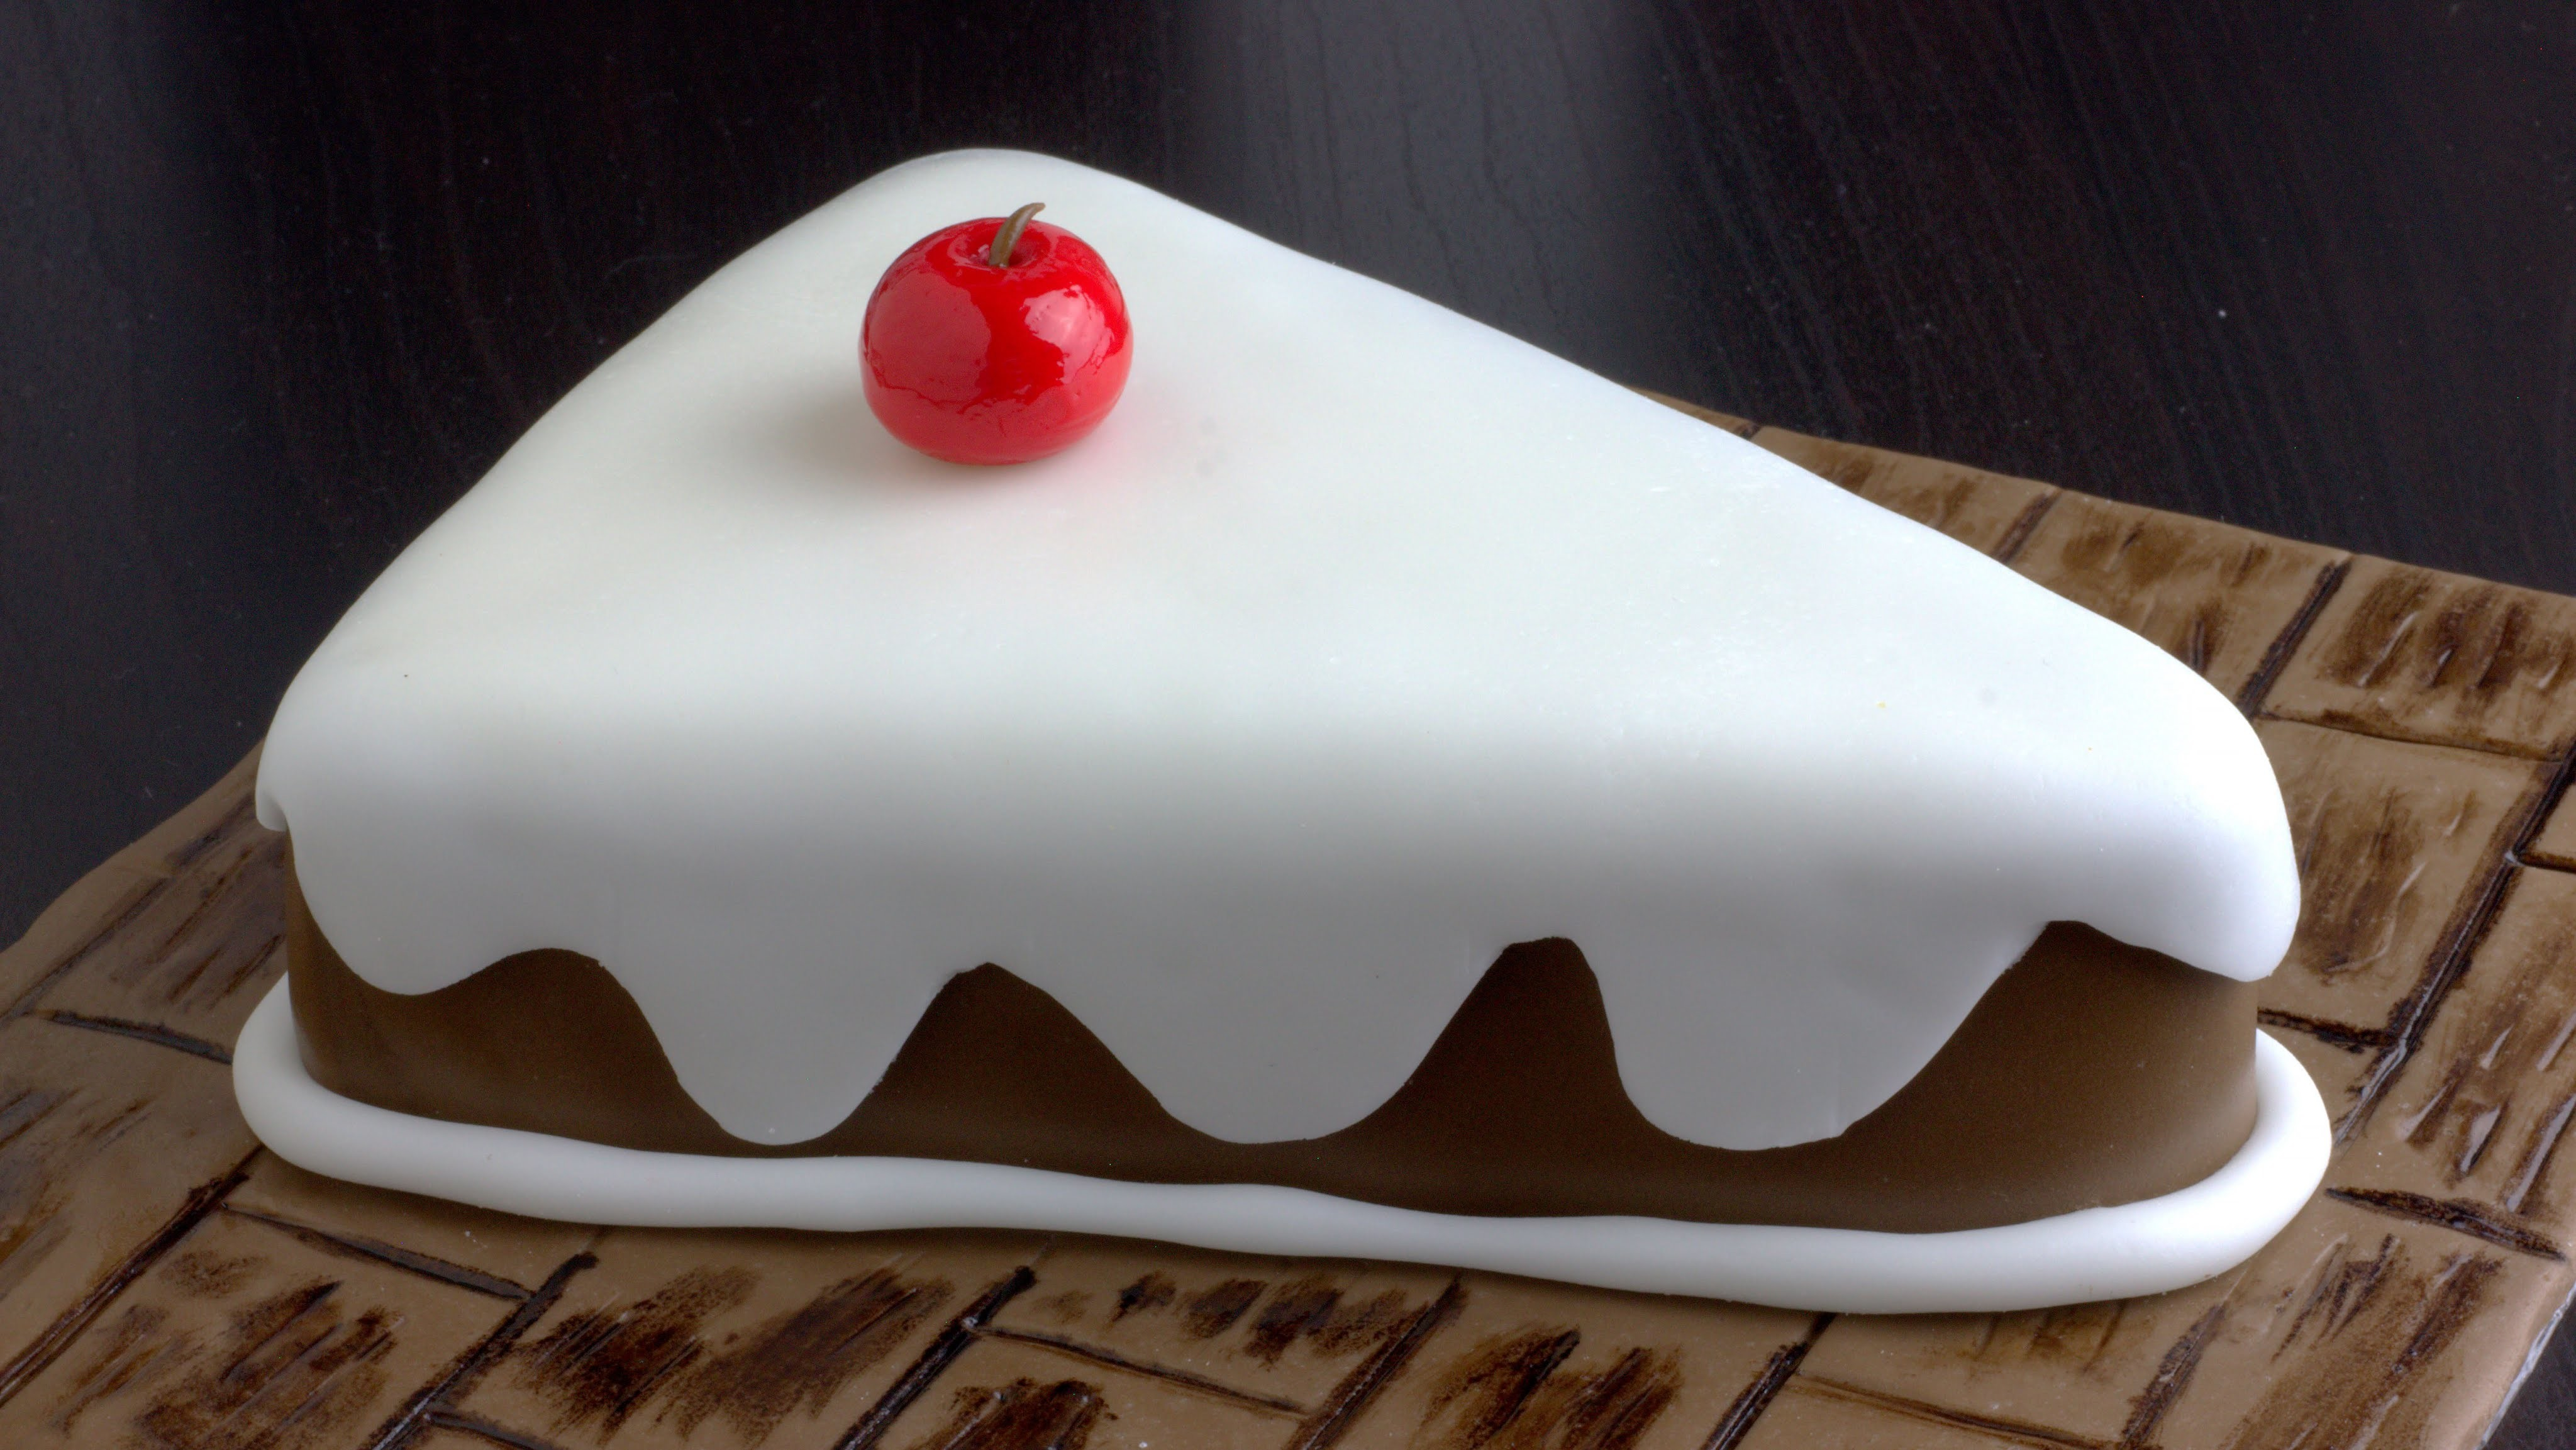 How to Make a Beautiful Fondant Cake Slice | HappyFoods